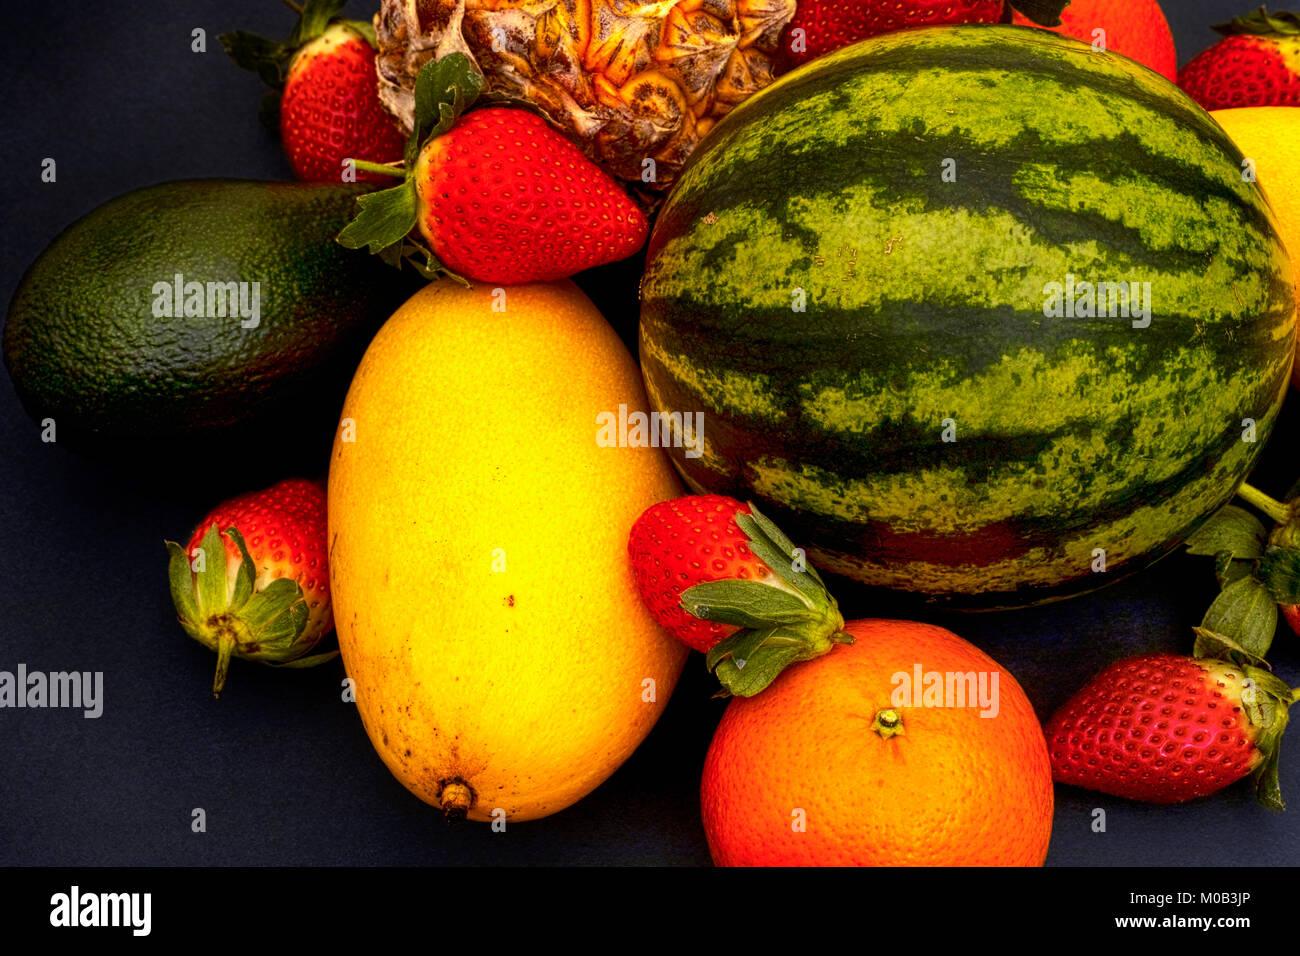 Watermelon, mango, strawberry, mandarin, pineapple and avocado on black background. Close-up. - Stock Image